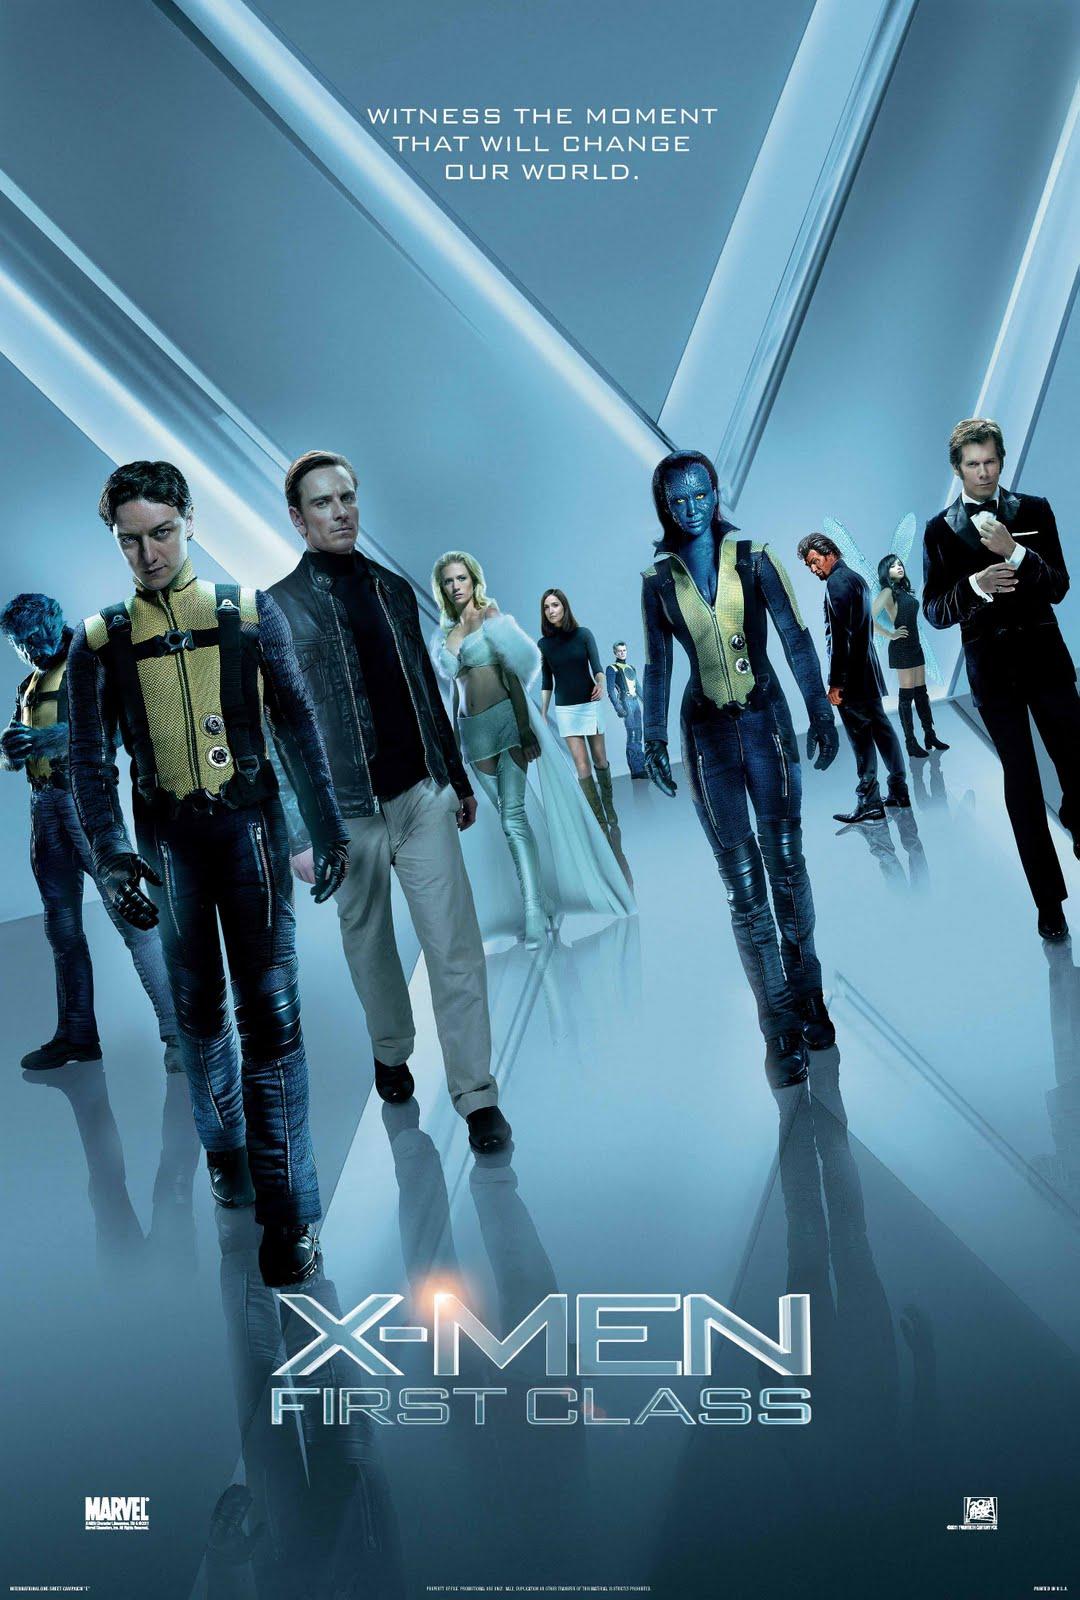 kianfai87 on PlayRole: X-Men First Class (2011)